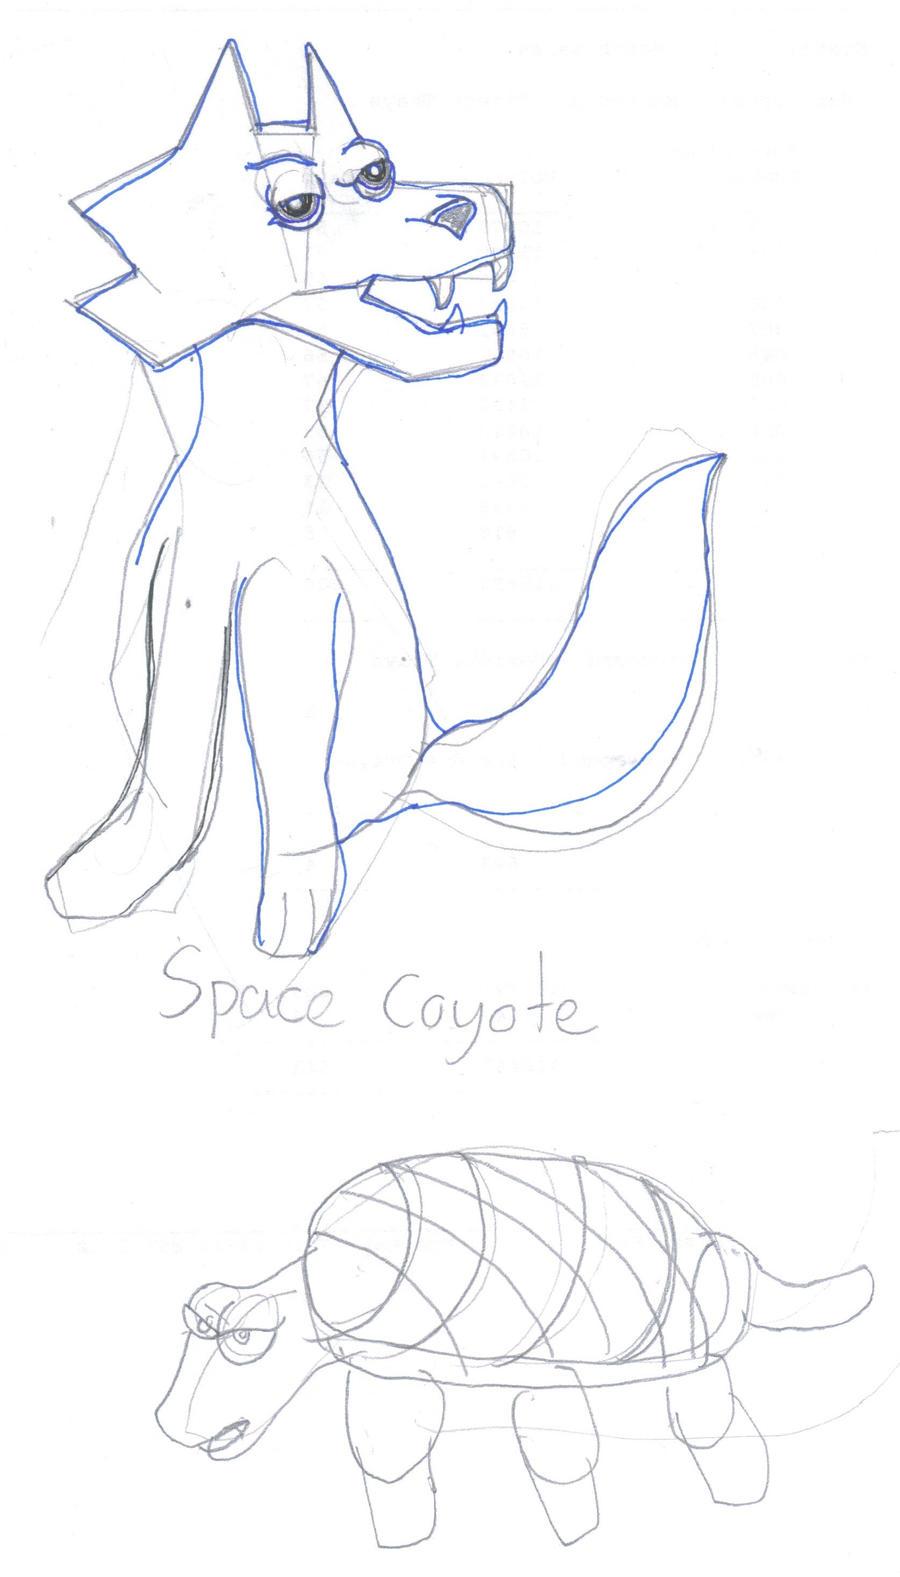 Space Coyote by safirediaz